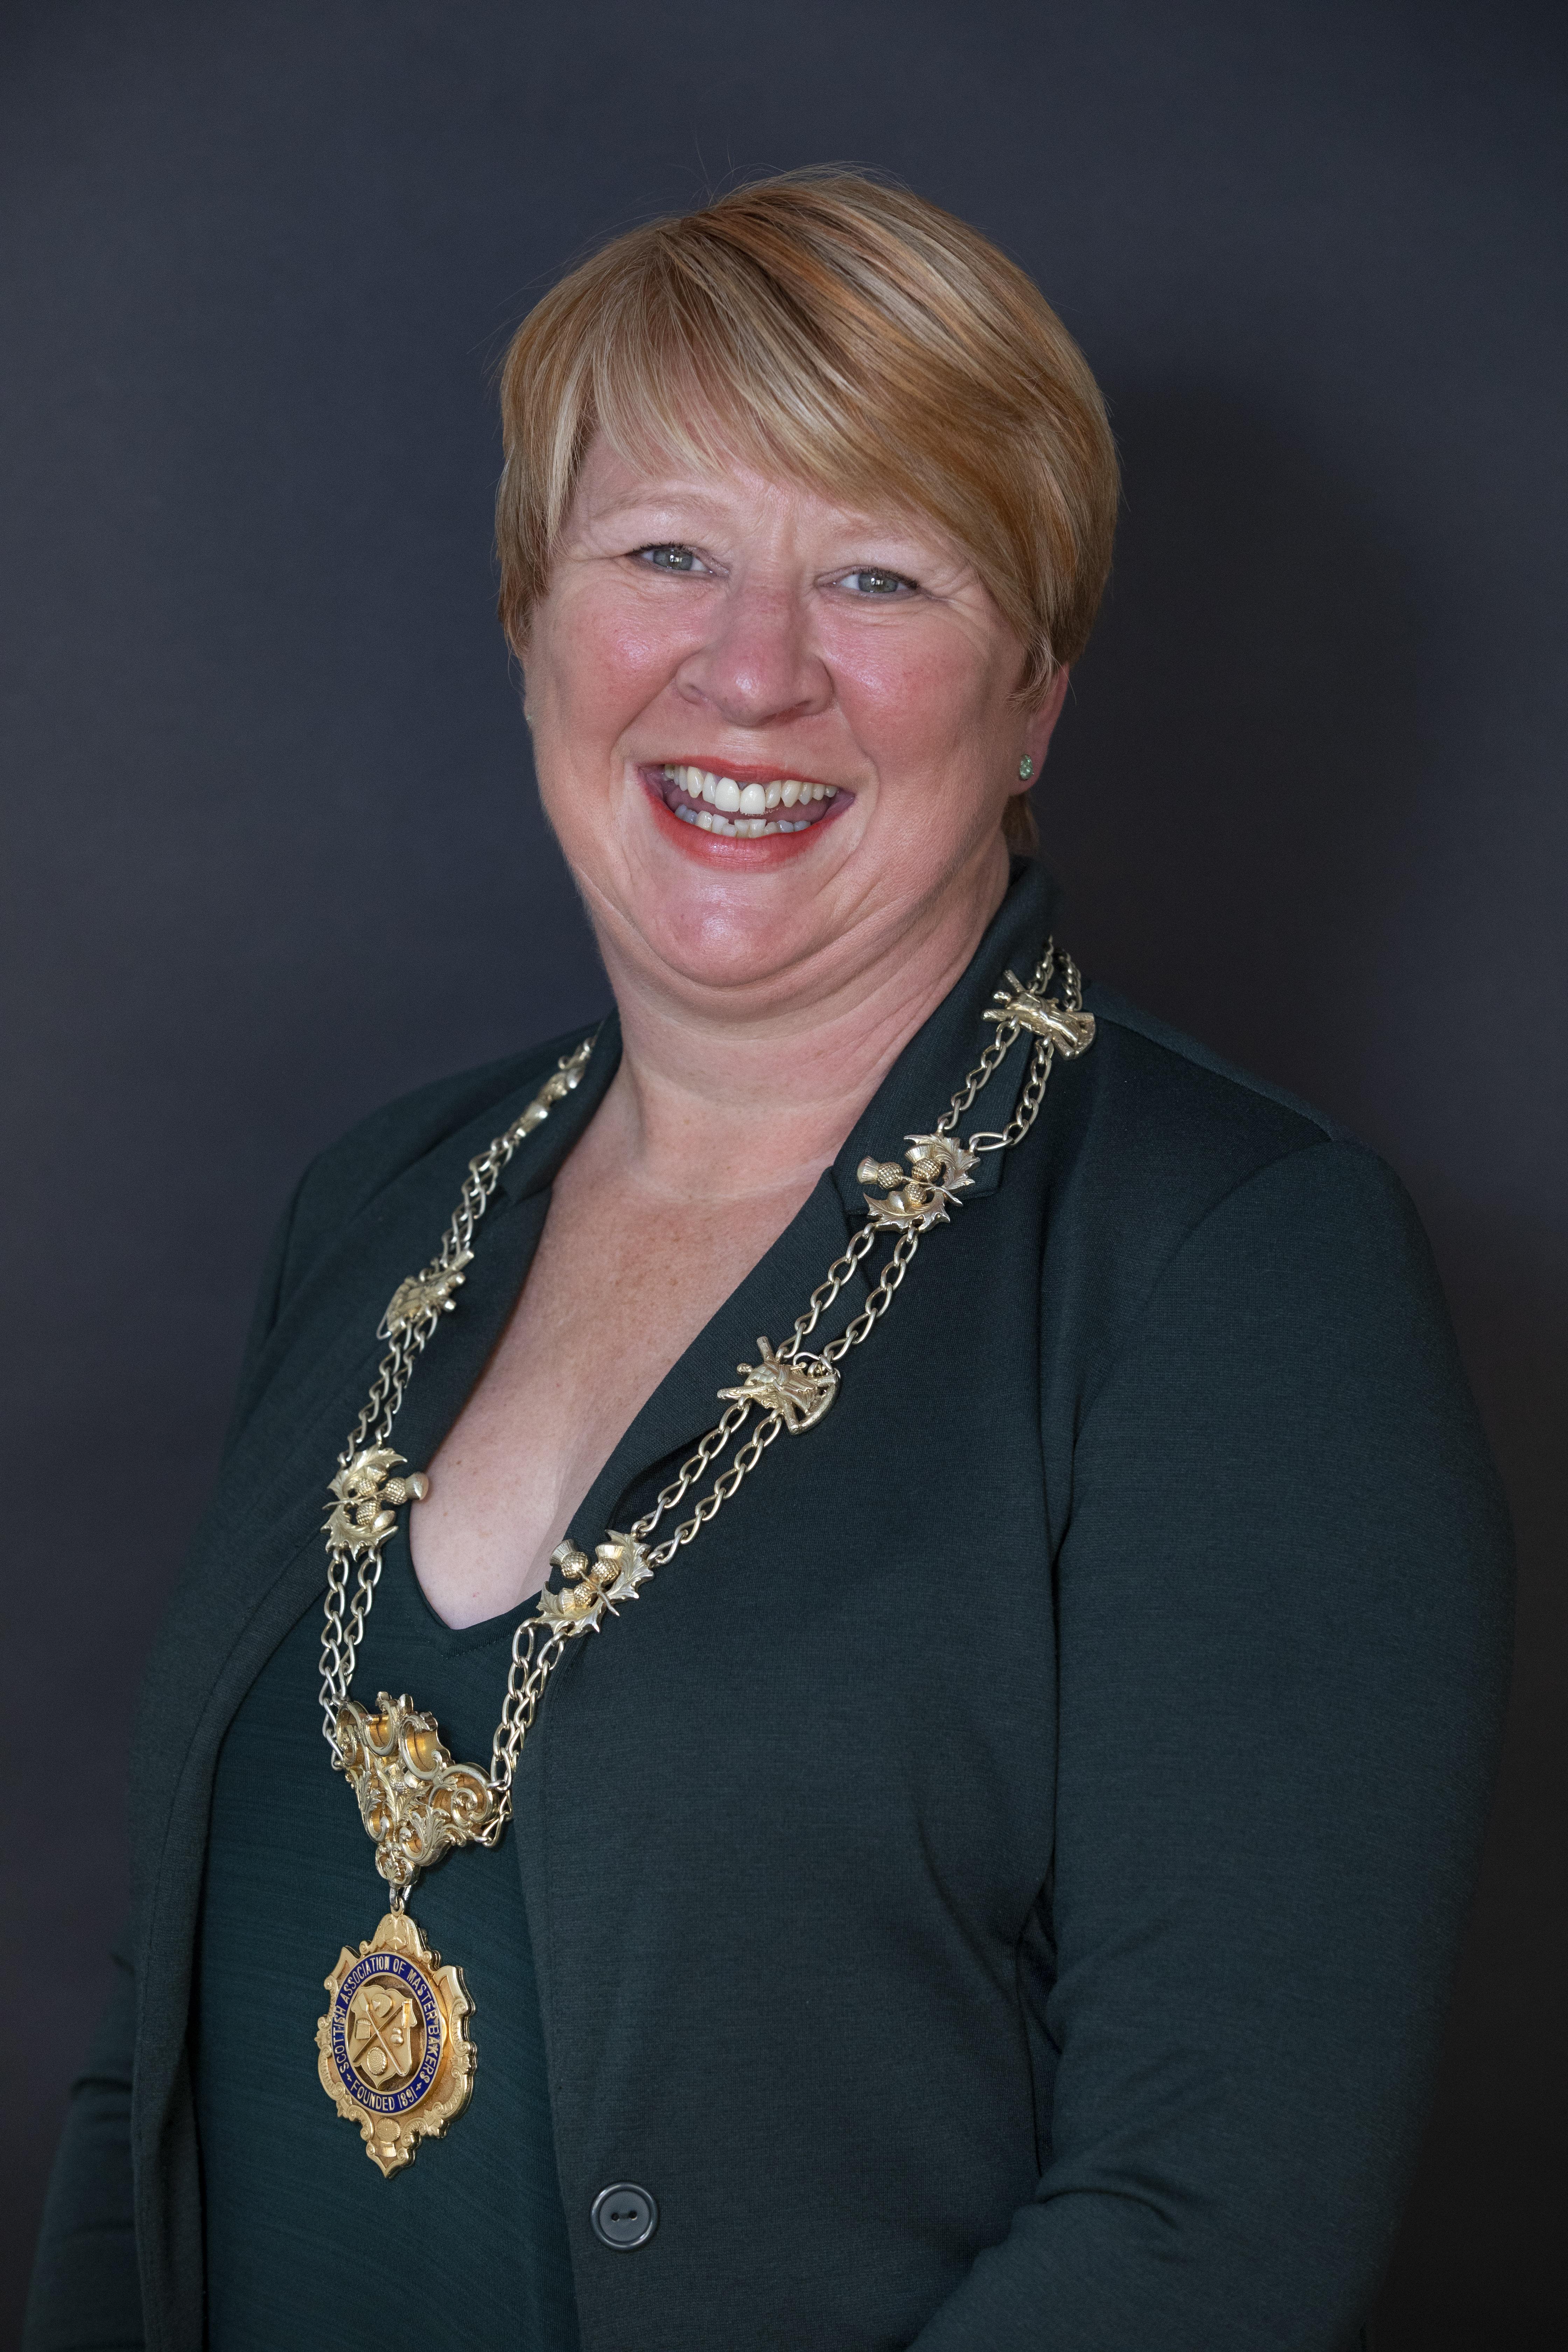 President Linda Hill, Murrays Bakers, Perth